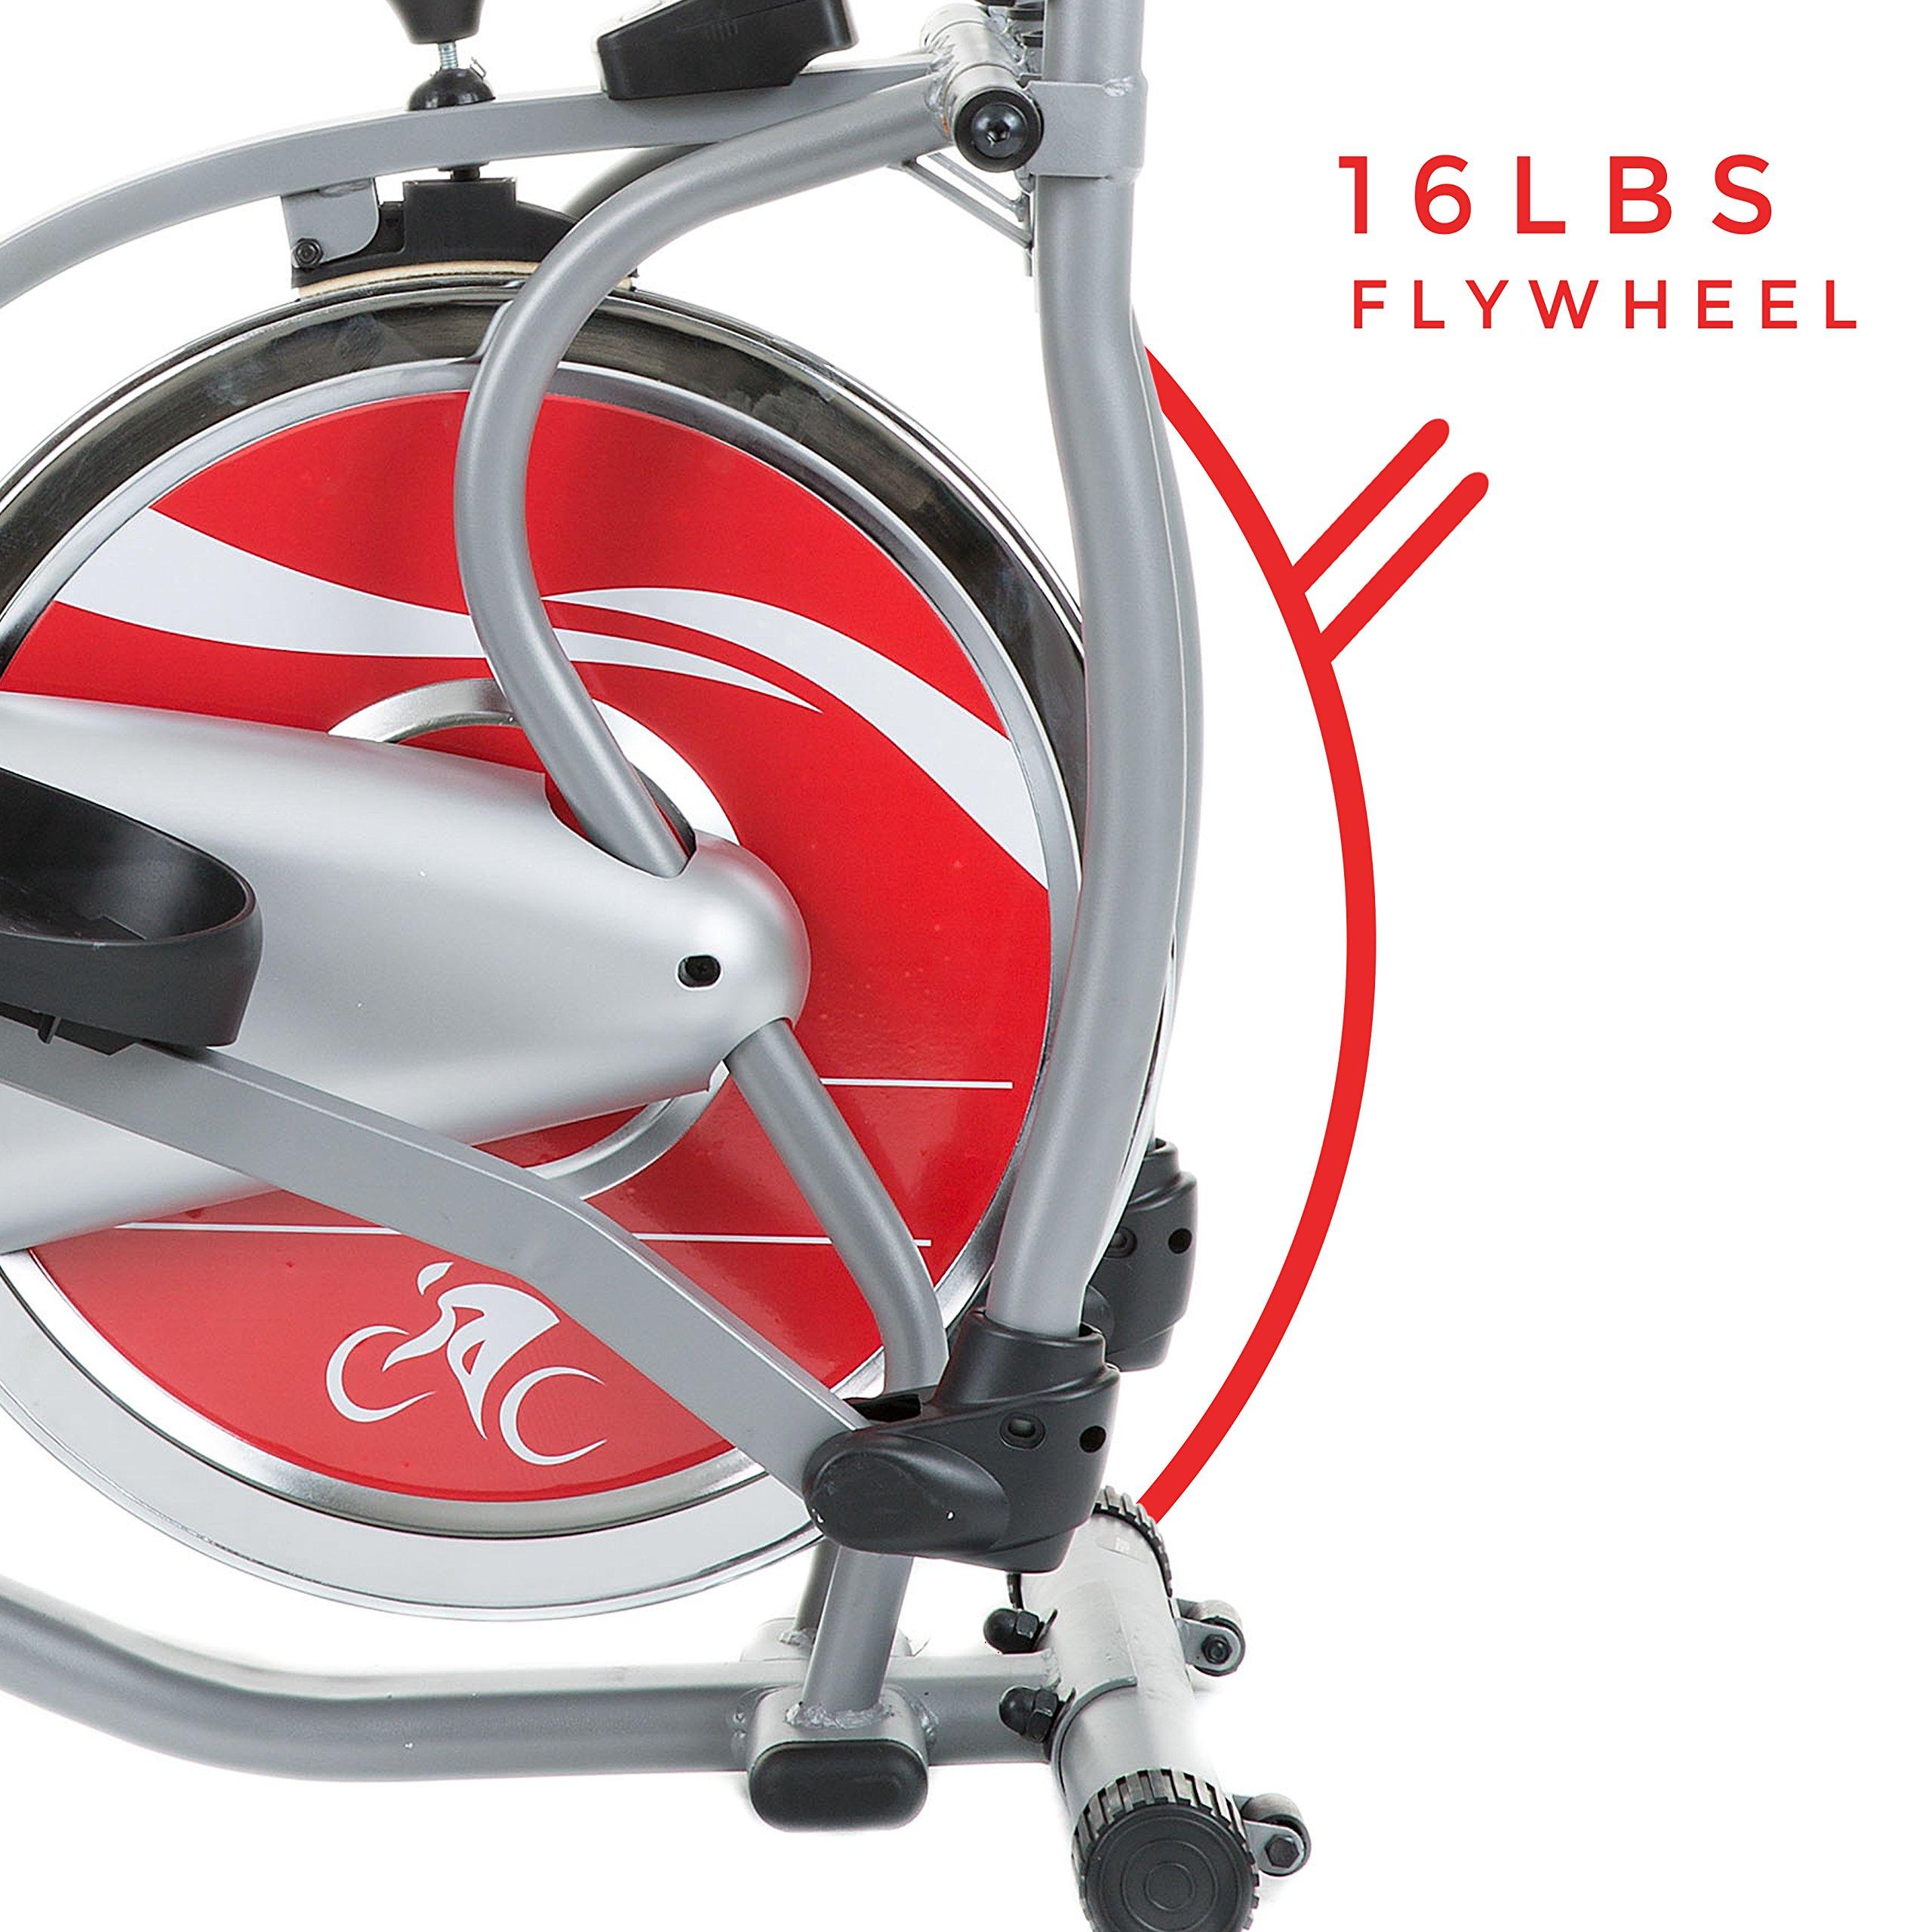 Sunny Health & Fitness SF-E1405 Flywheel Elliptical Trainer, Gray by Sunny Health & Fitness (Image #8)